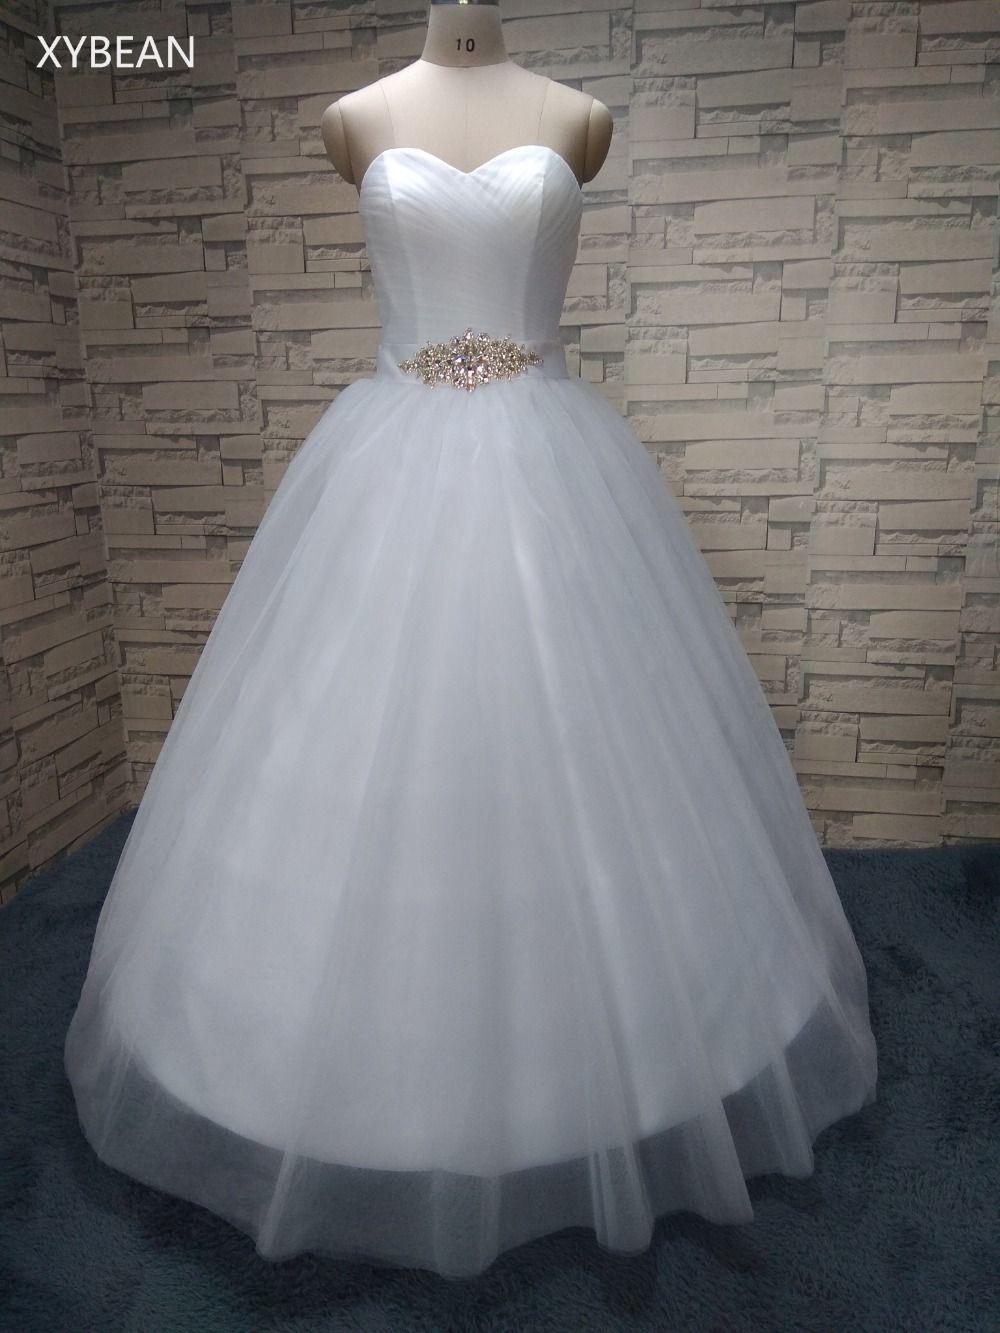 2018 New Arrival Bridal White/Ivory Wedding Dress bridal Gown Custom Size 4 6 8 10 12 14 16 18